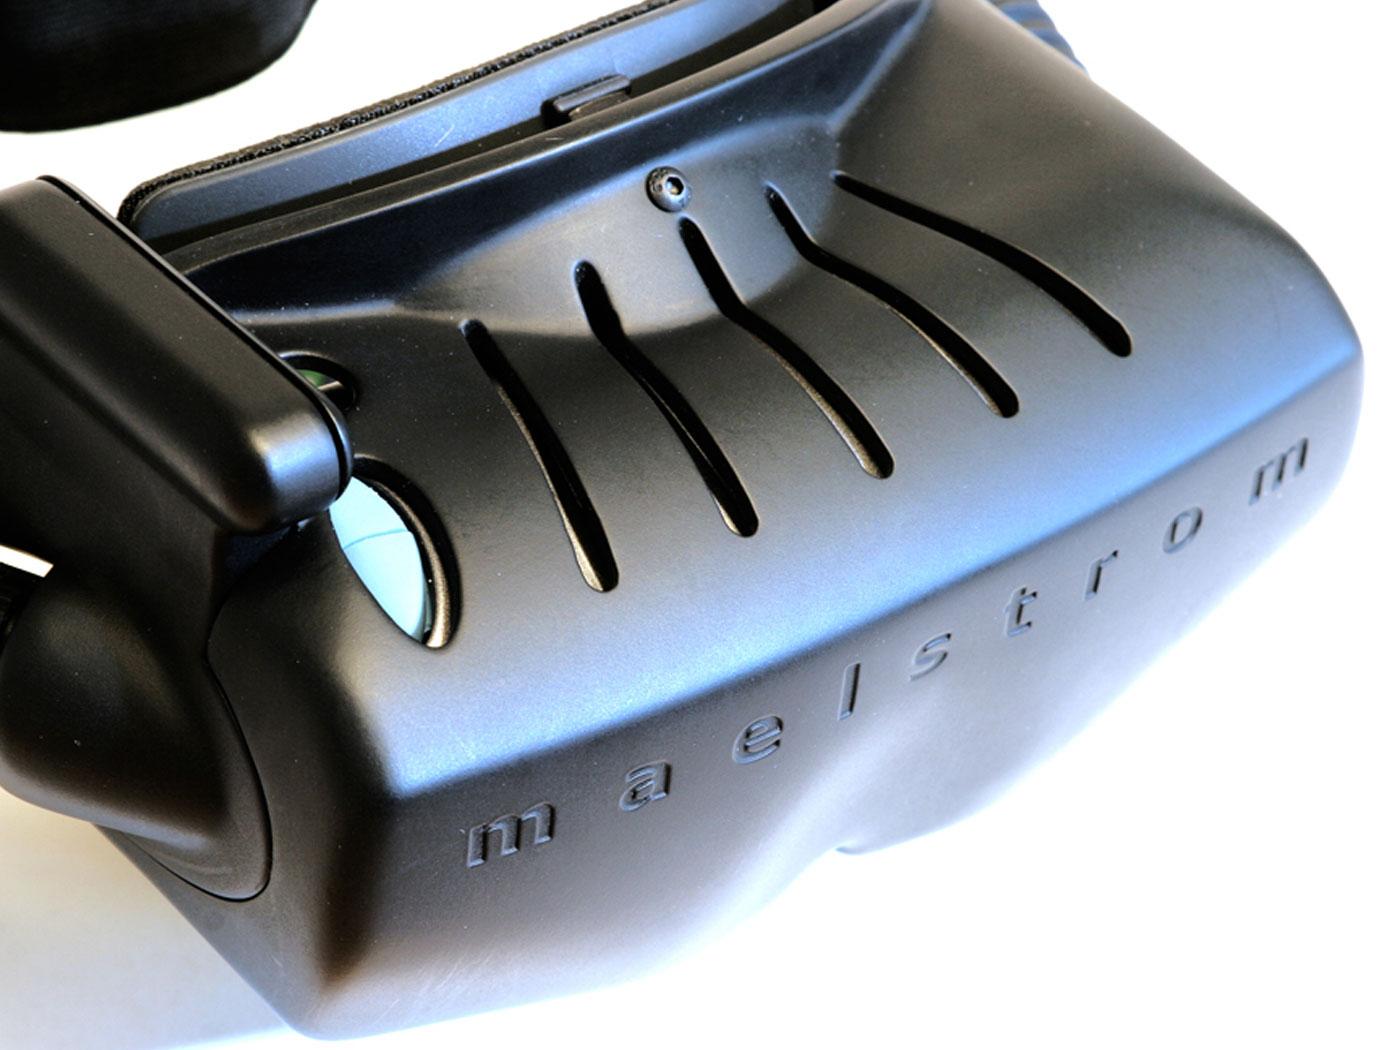 virtual-reality-headset-01